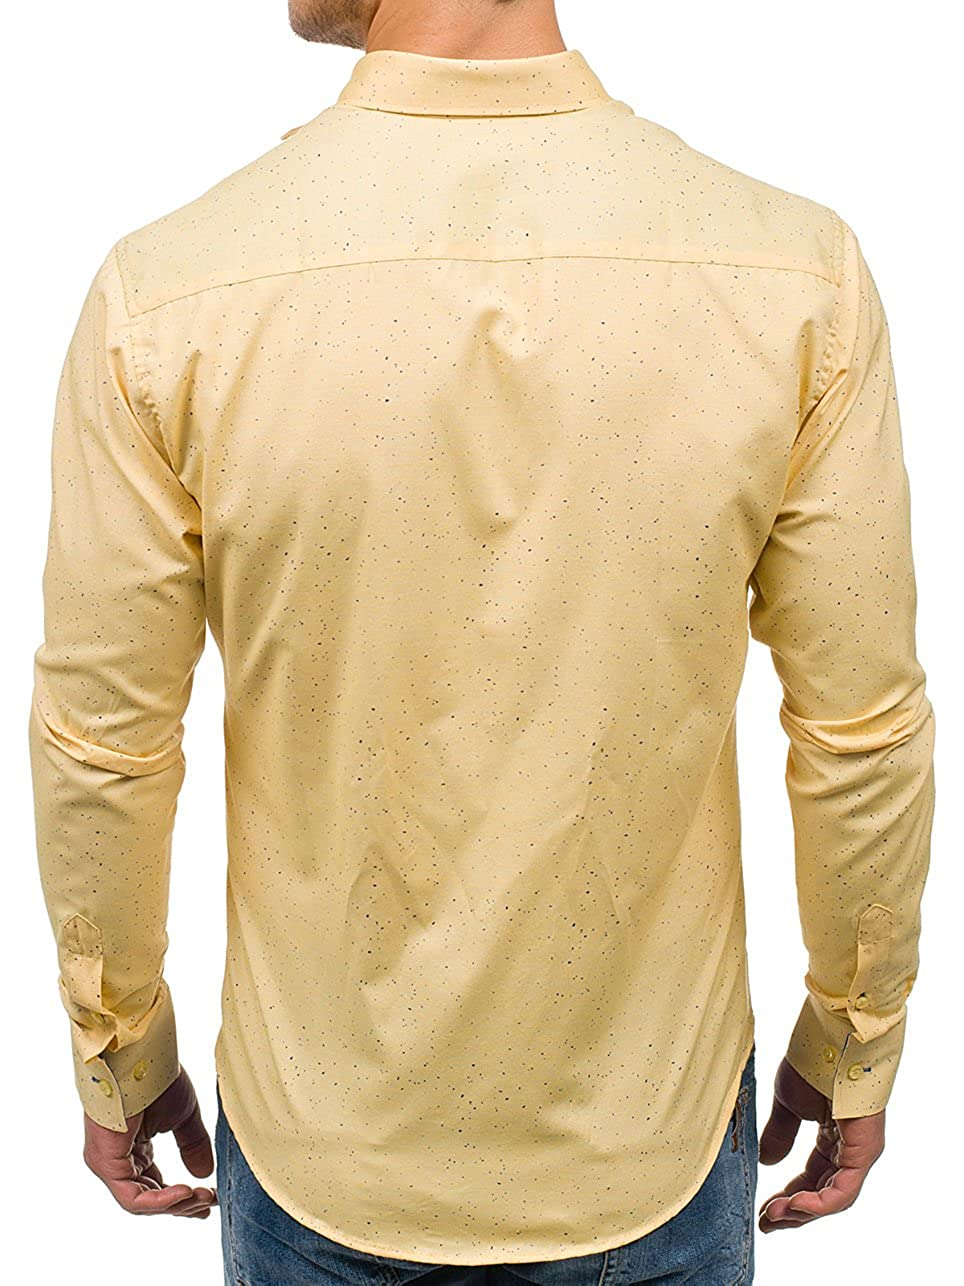 6ba9f9acb BOLF Hombre Camisa Elegante Abotonada Manga Larga Estilo Casual Mix BOLF  4747-1